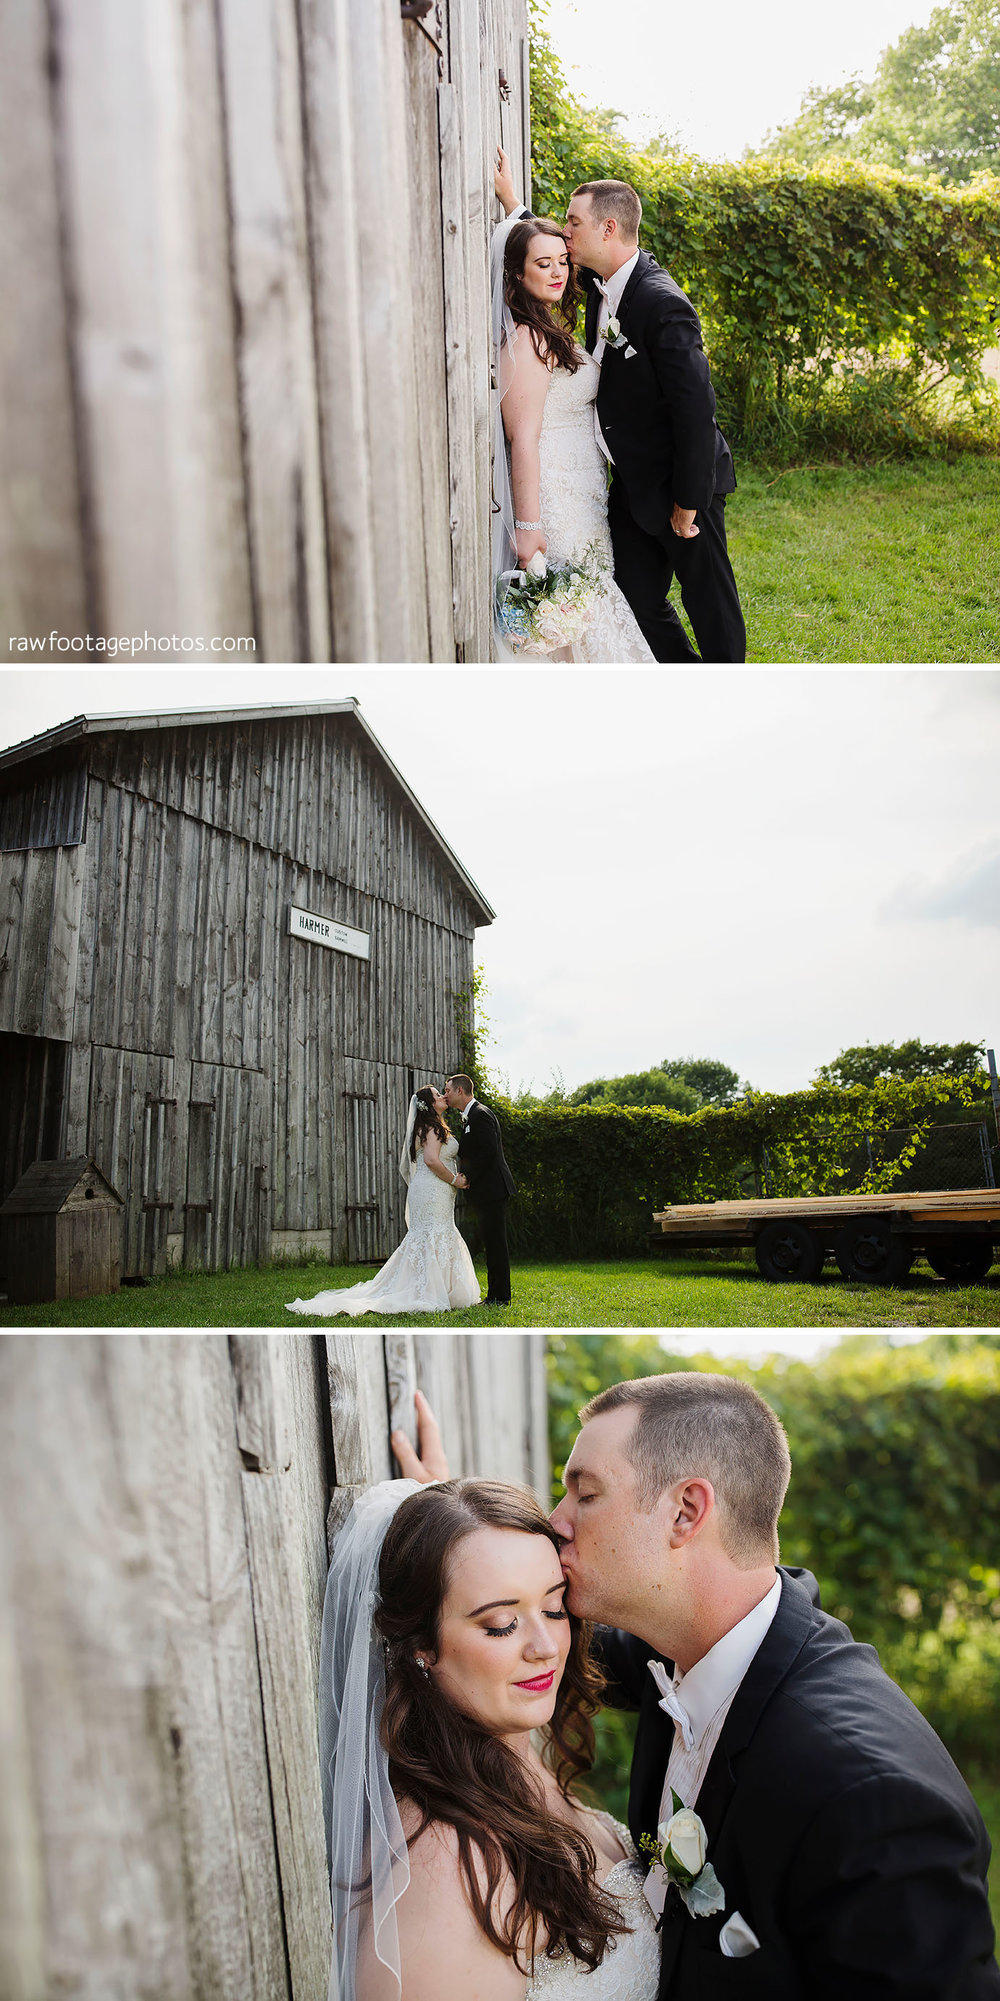 Fanshawe Pioneer Village Wedding Portraits